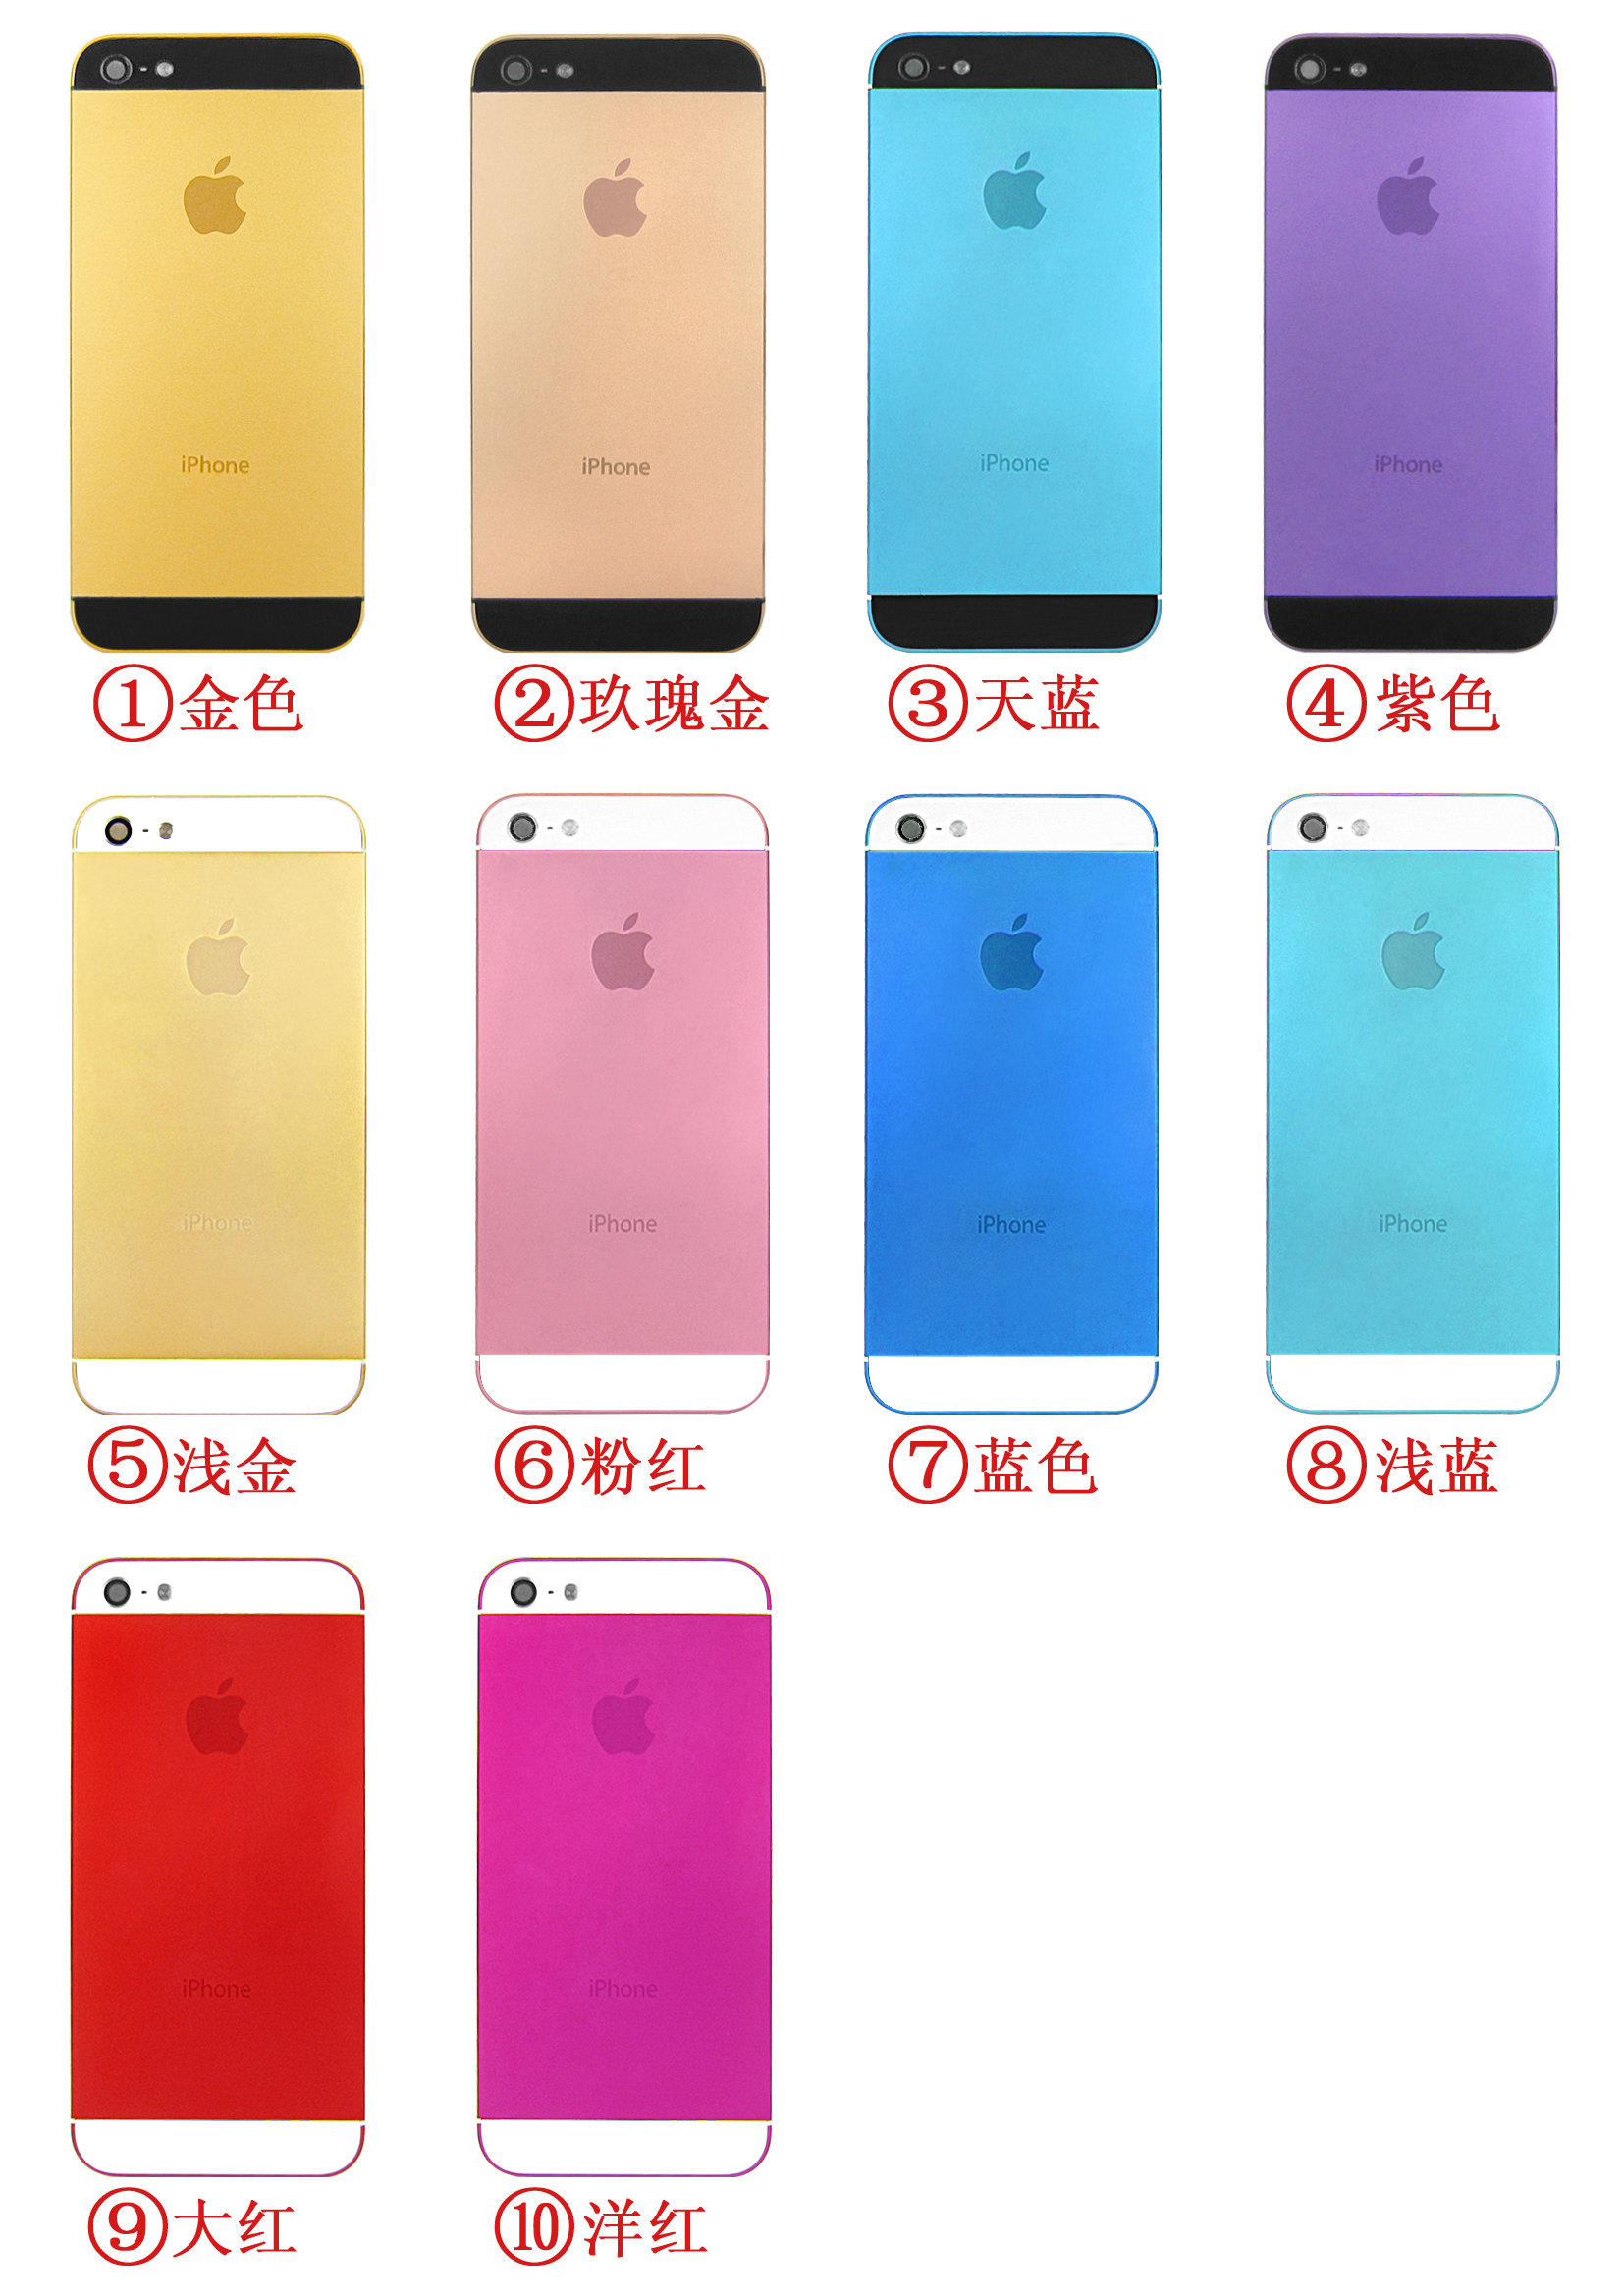 iphone5高仿壳 彩色壳 彩壳